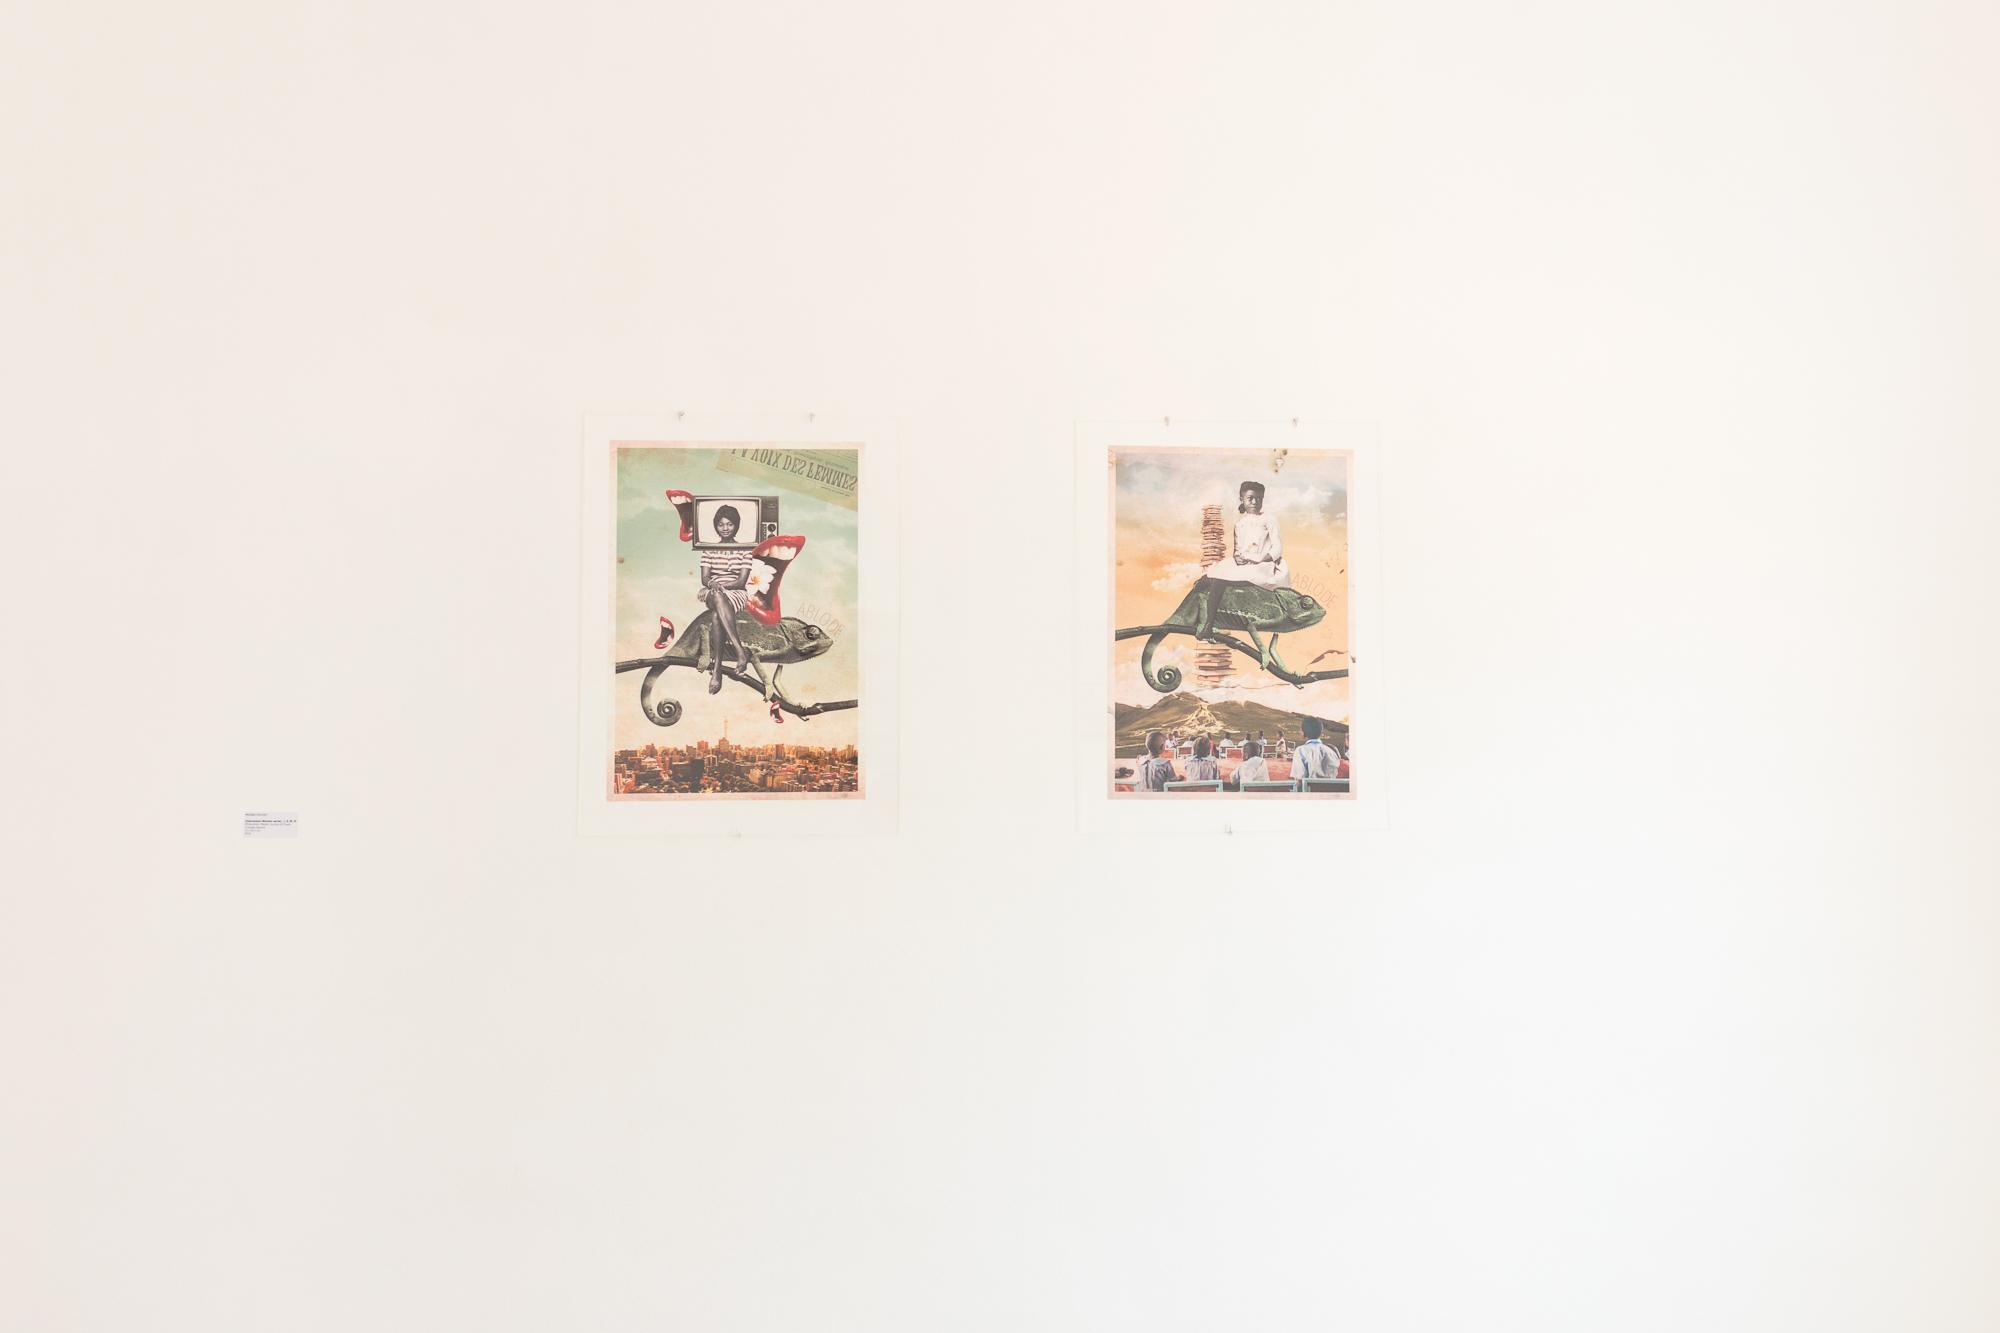 Mounia Youssef, Chameleon Women series, 2019